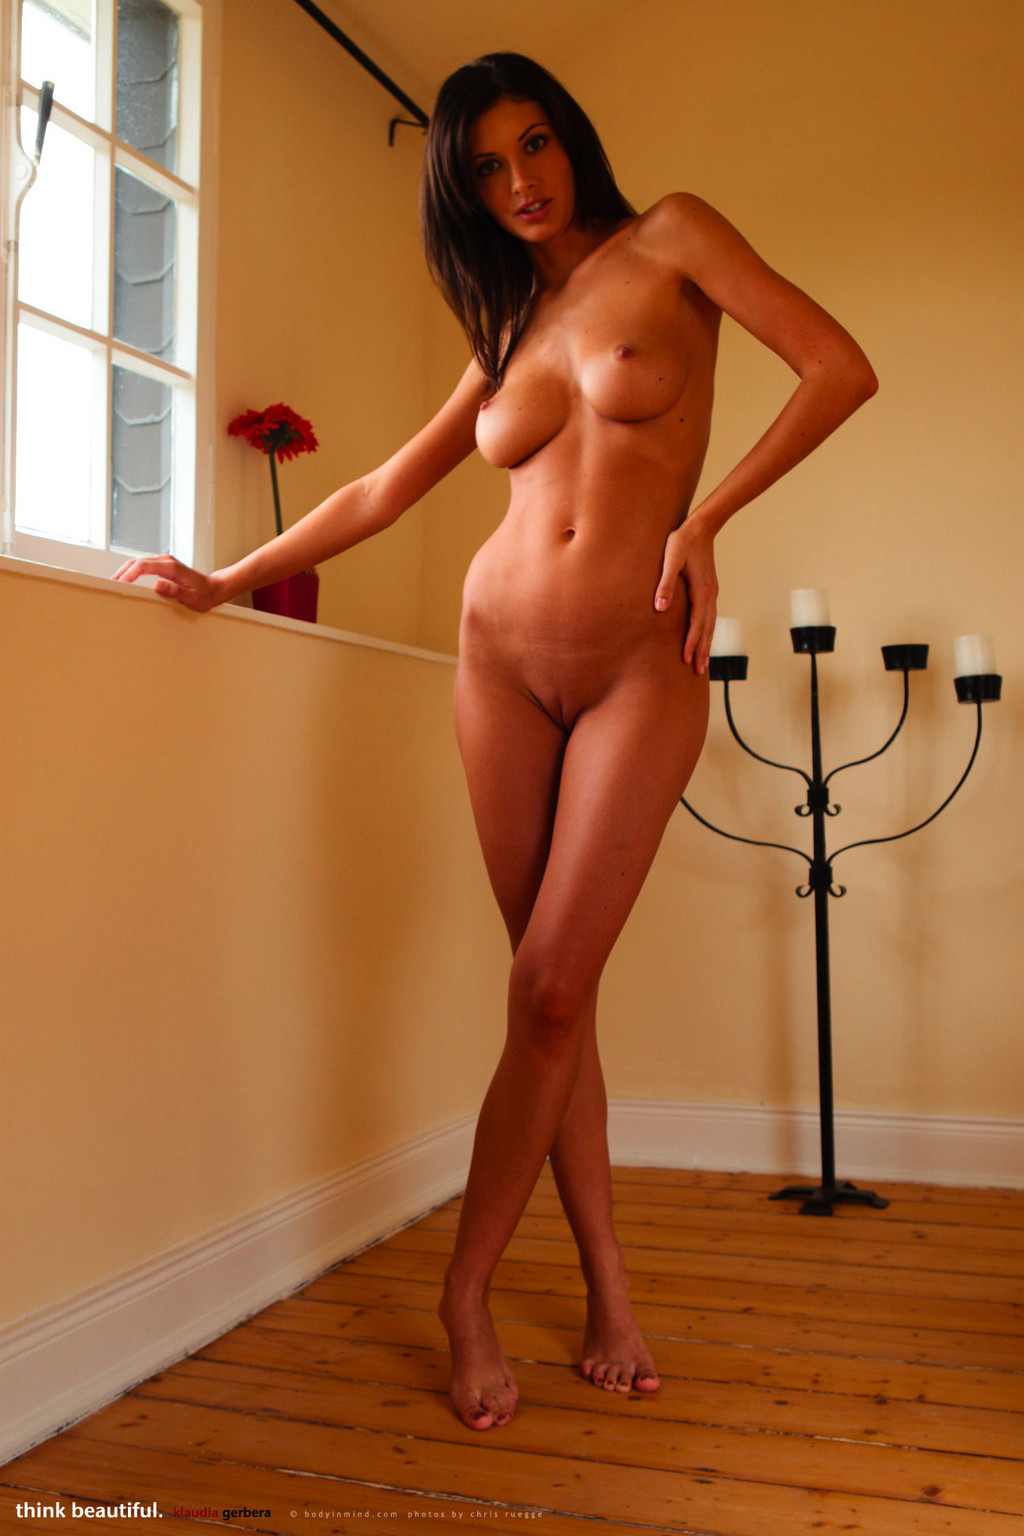 klaudia-gerbera-nude-think-beautiful-bodyinmind-10